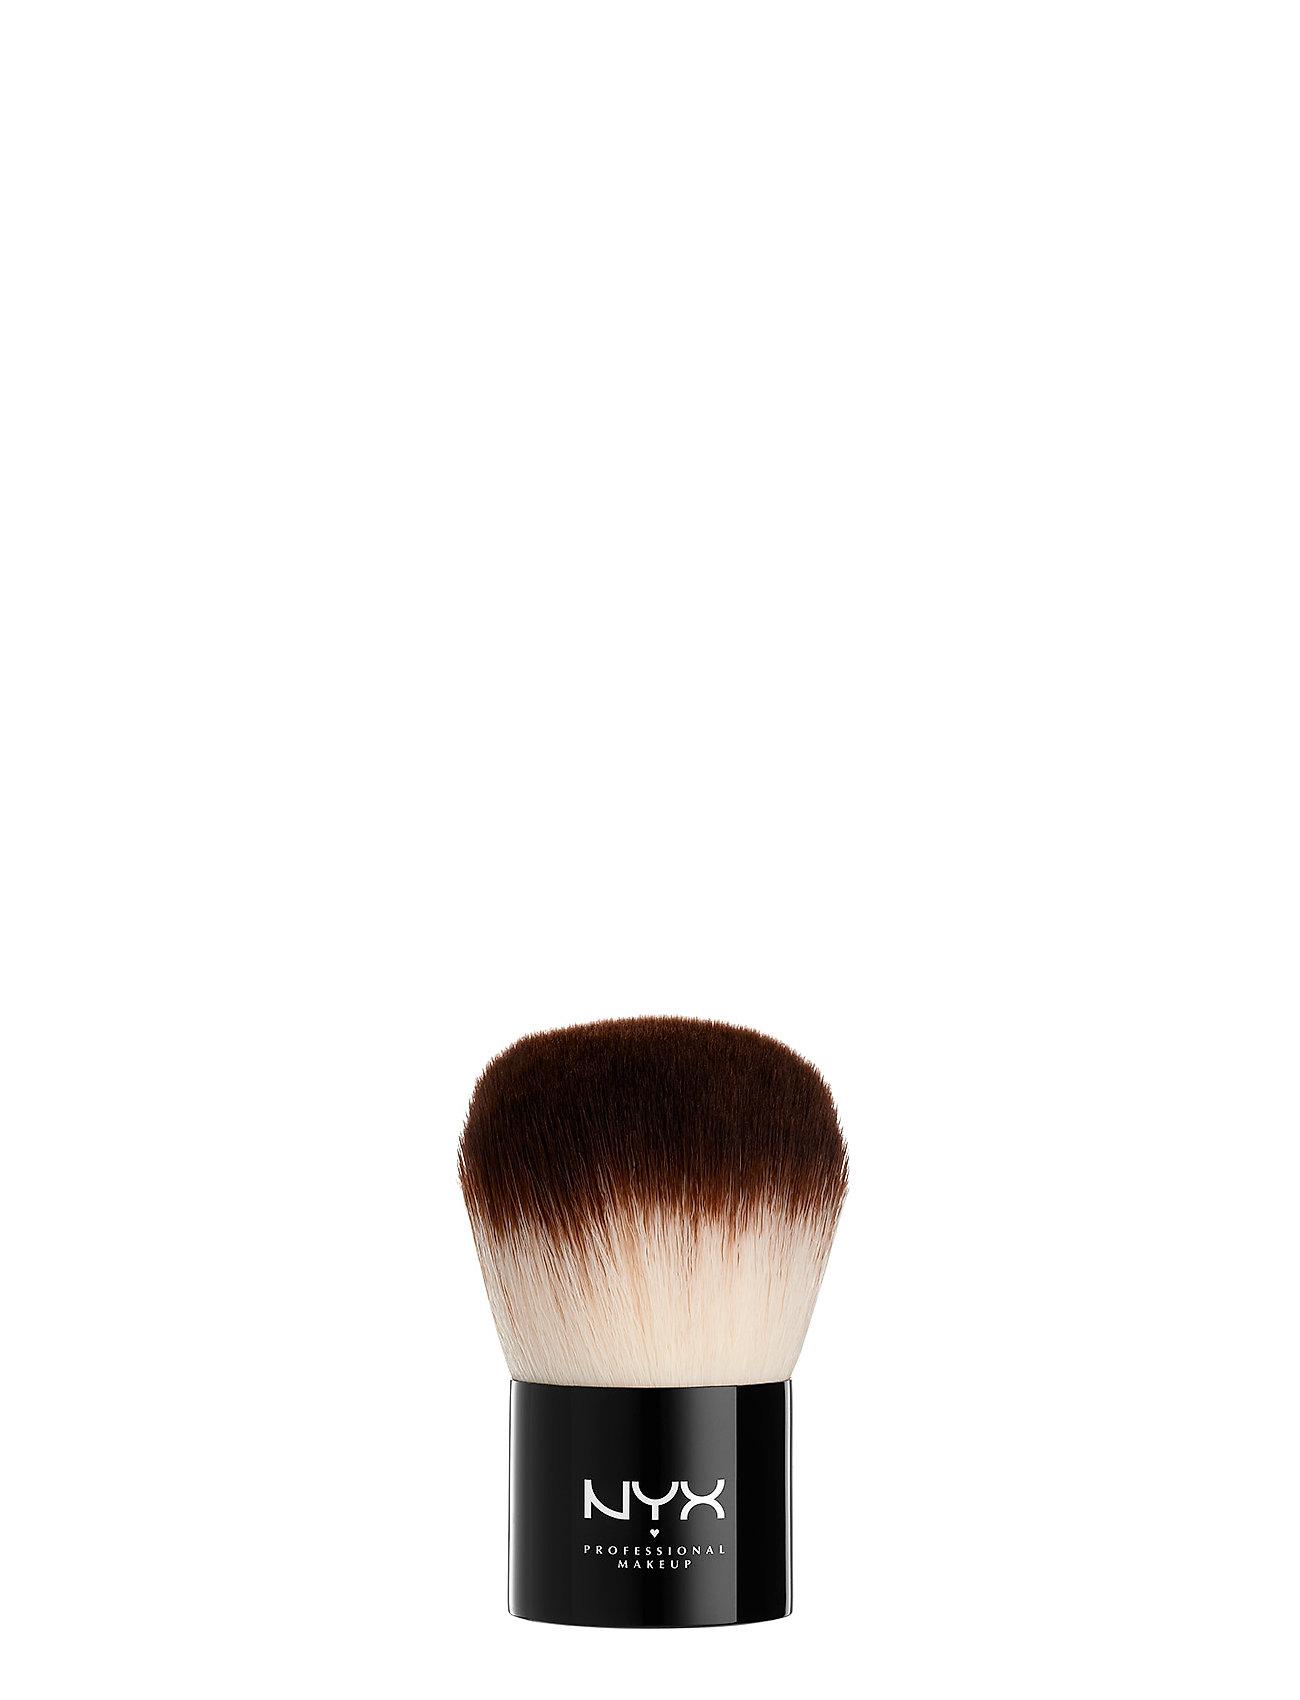 Image of Pro Kabuki Brush Beauty WOMEN Makeup Makeup Brushes Face Brushes Nude NYX PROFESSIONAL MAKEUP (3416948409)